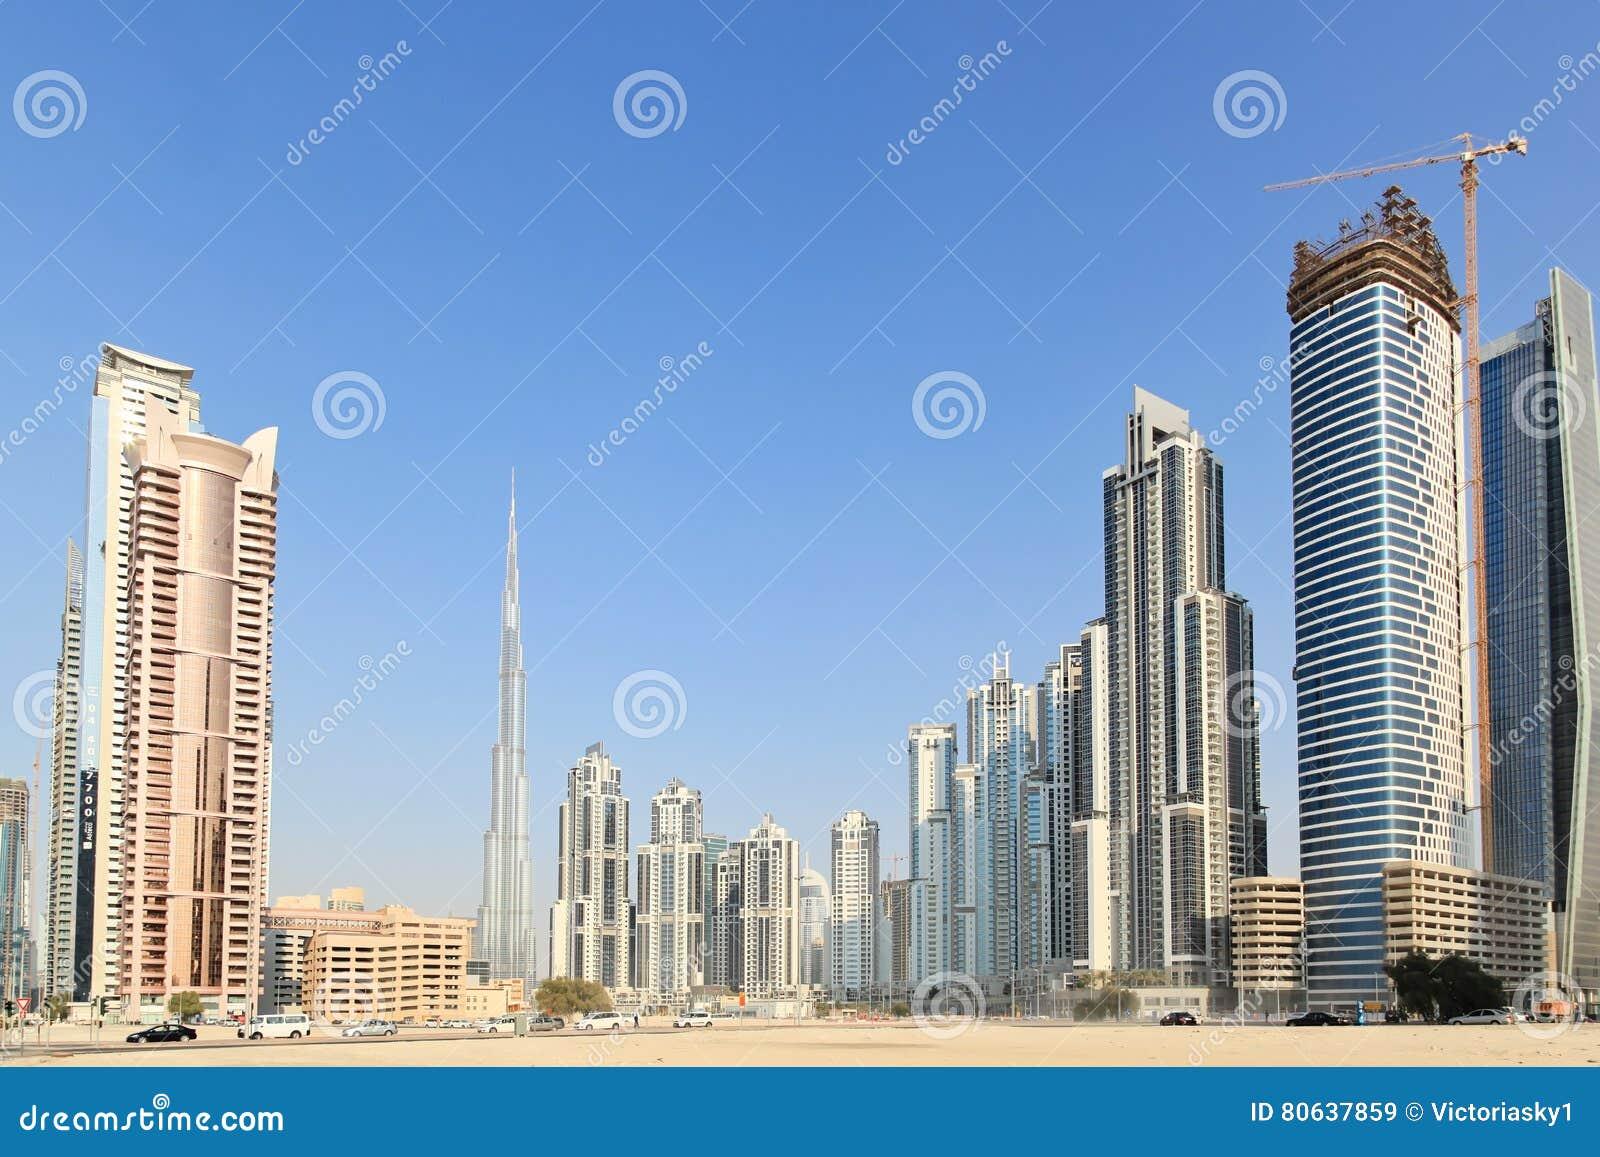 edificios en dubai cntrico burj khalifa